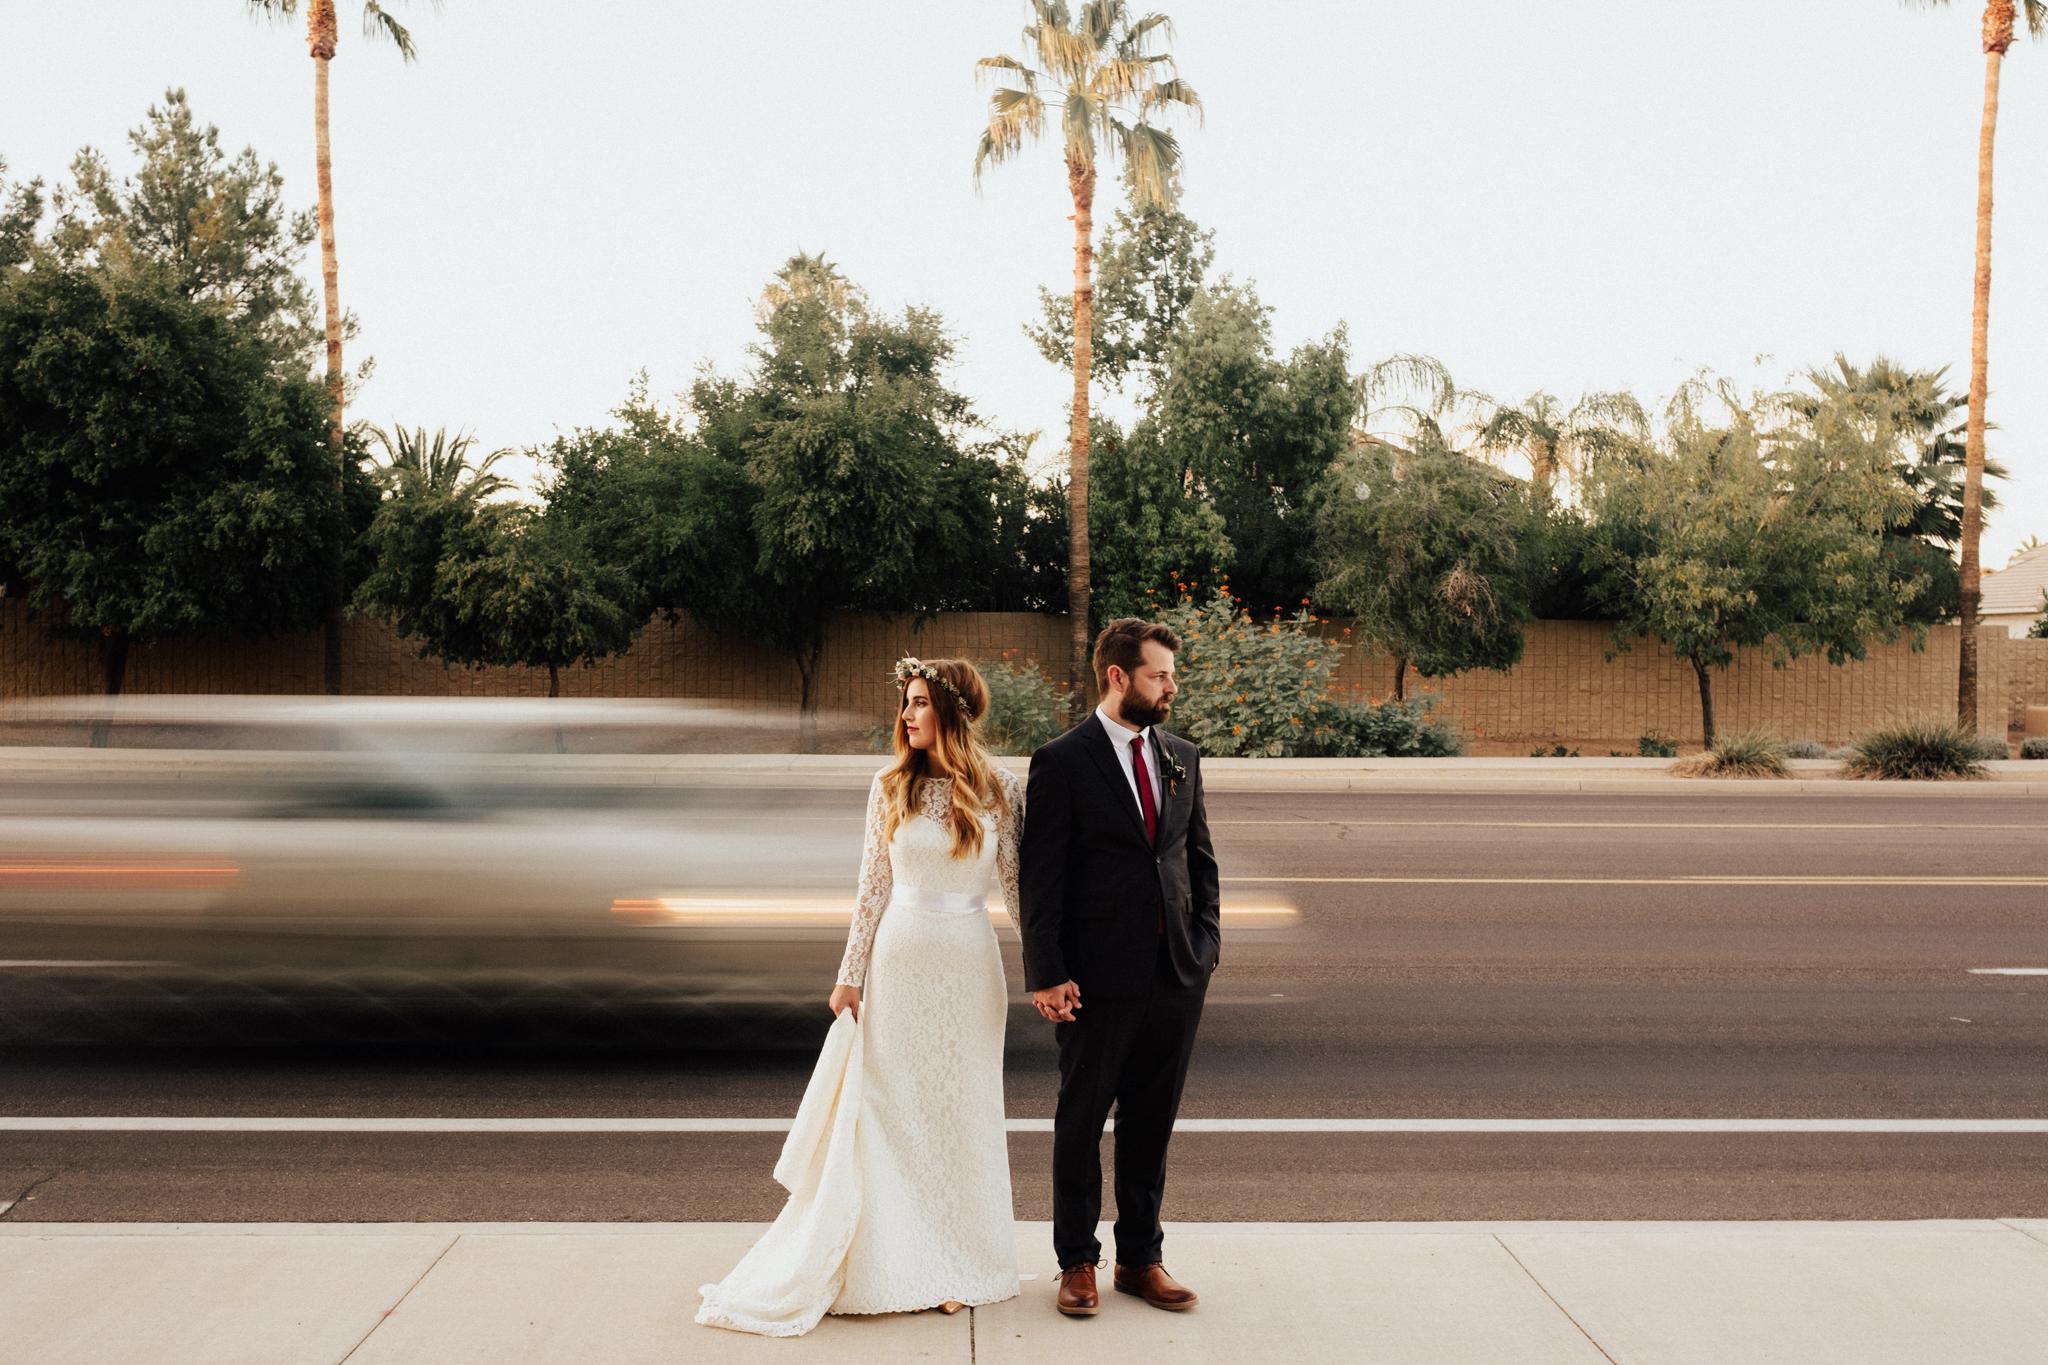 Arizona-Adventure-Elopement-Wedding-Photographer-178.jpg